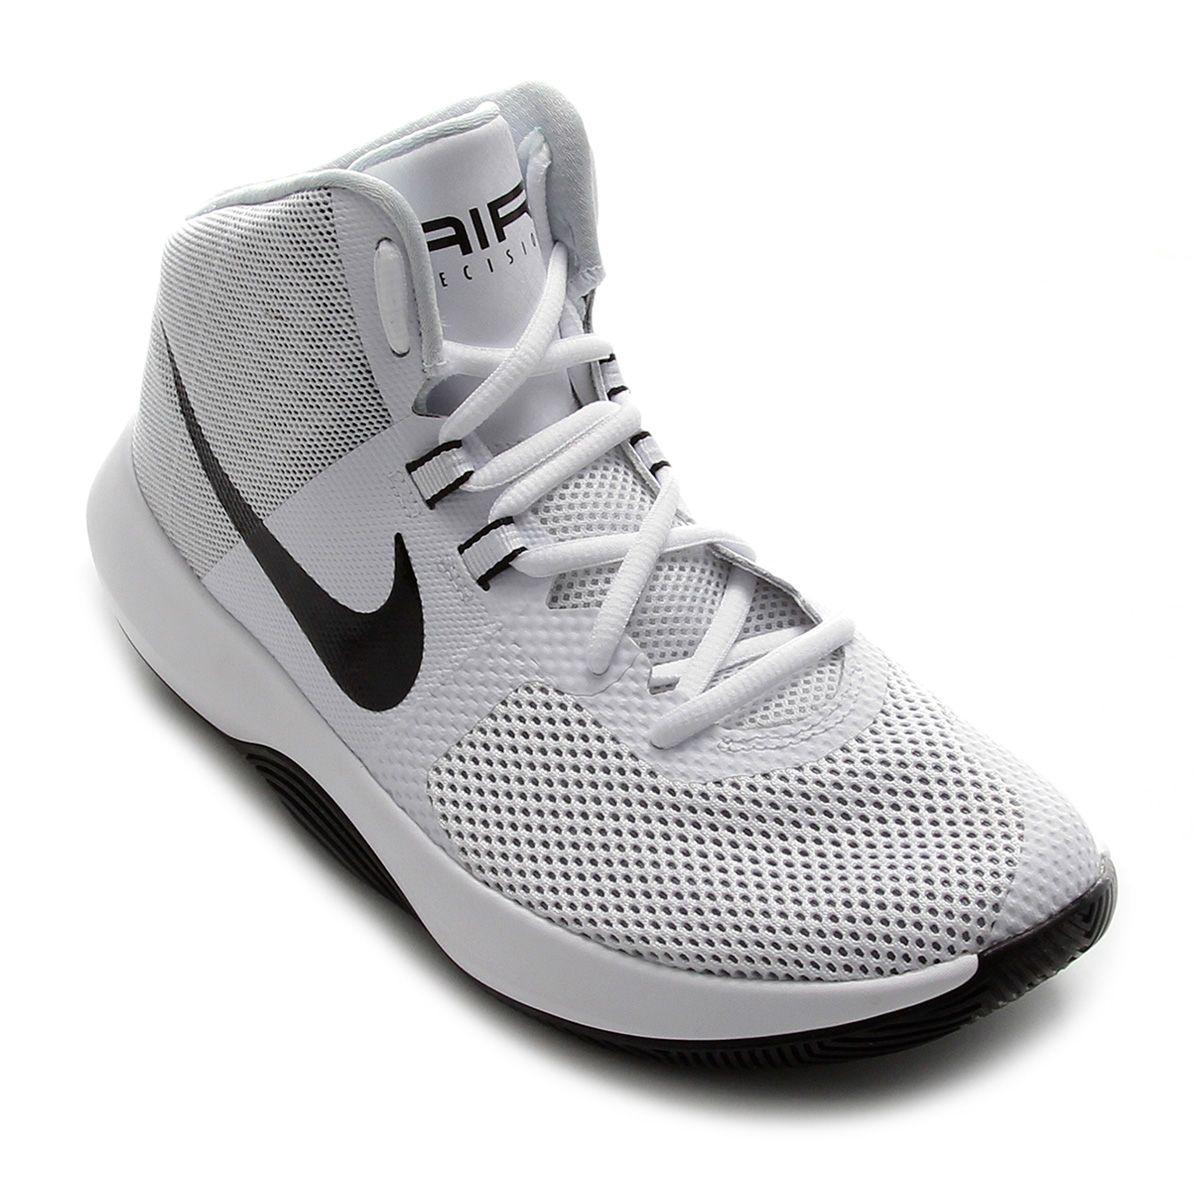 Tênis Cano Alto Nike Air Precision Masculino - Branco  1bd23822ed52b